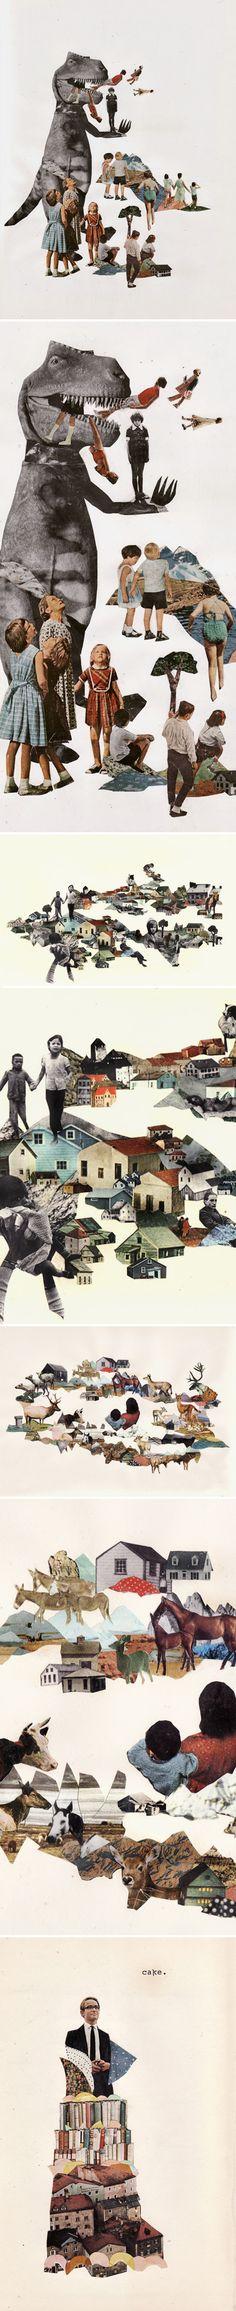 ashlie chavez - collage <3